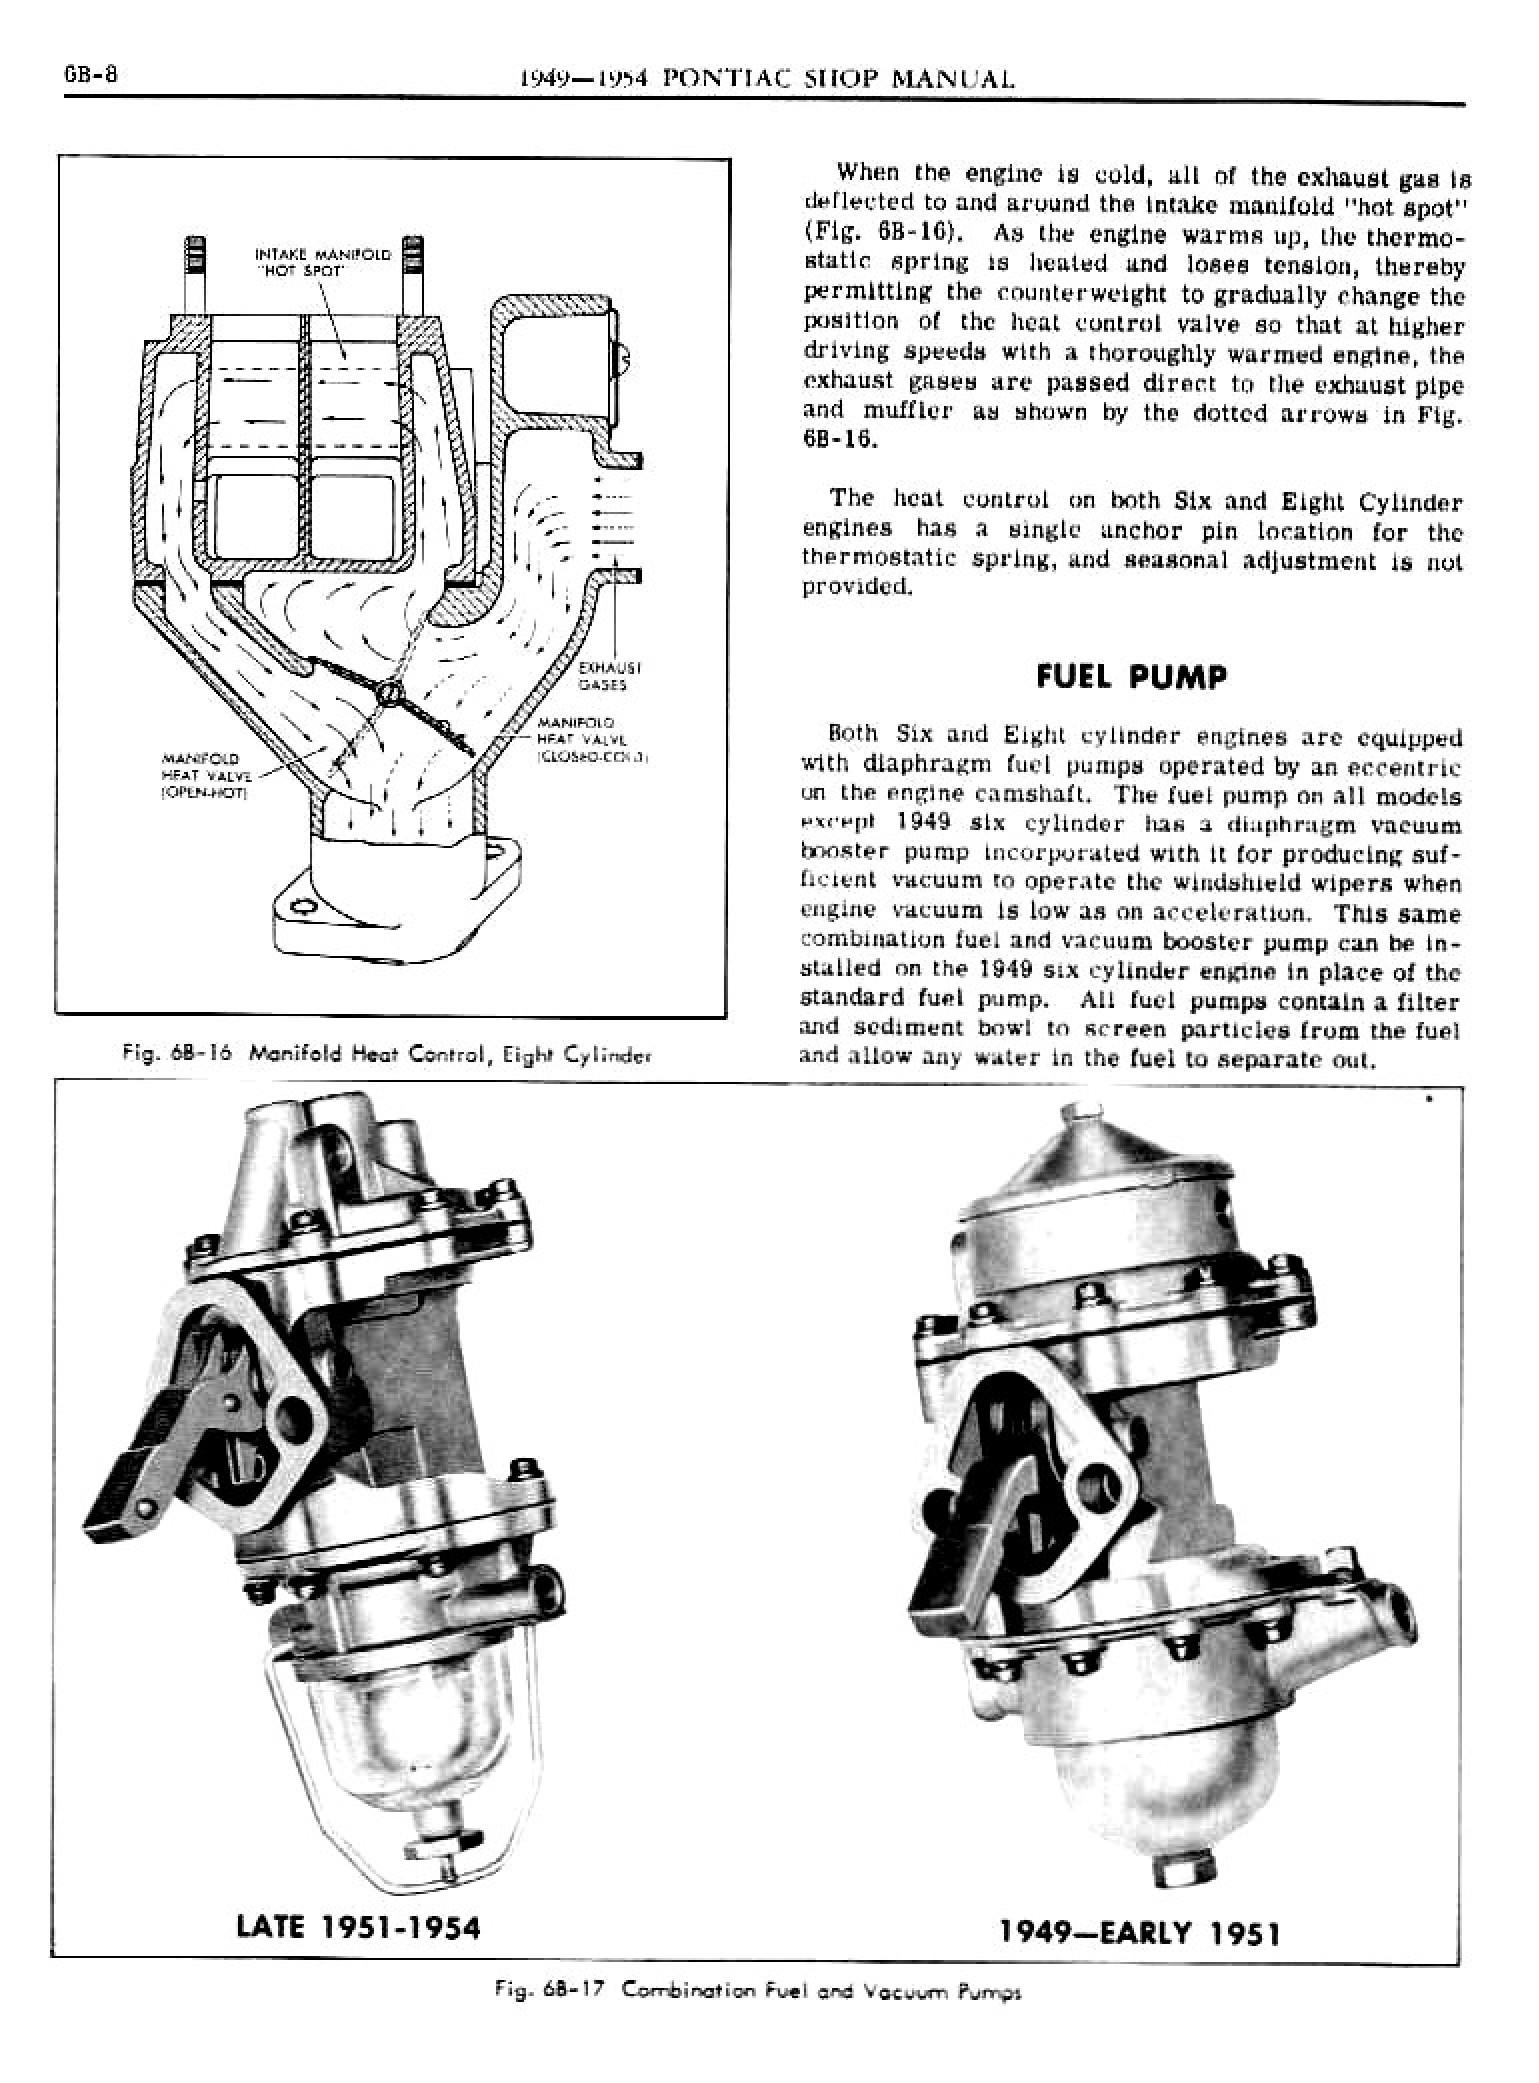 1949 Pontiac Shop Manual- Engine Fuel Page 8 of 42